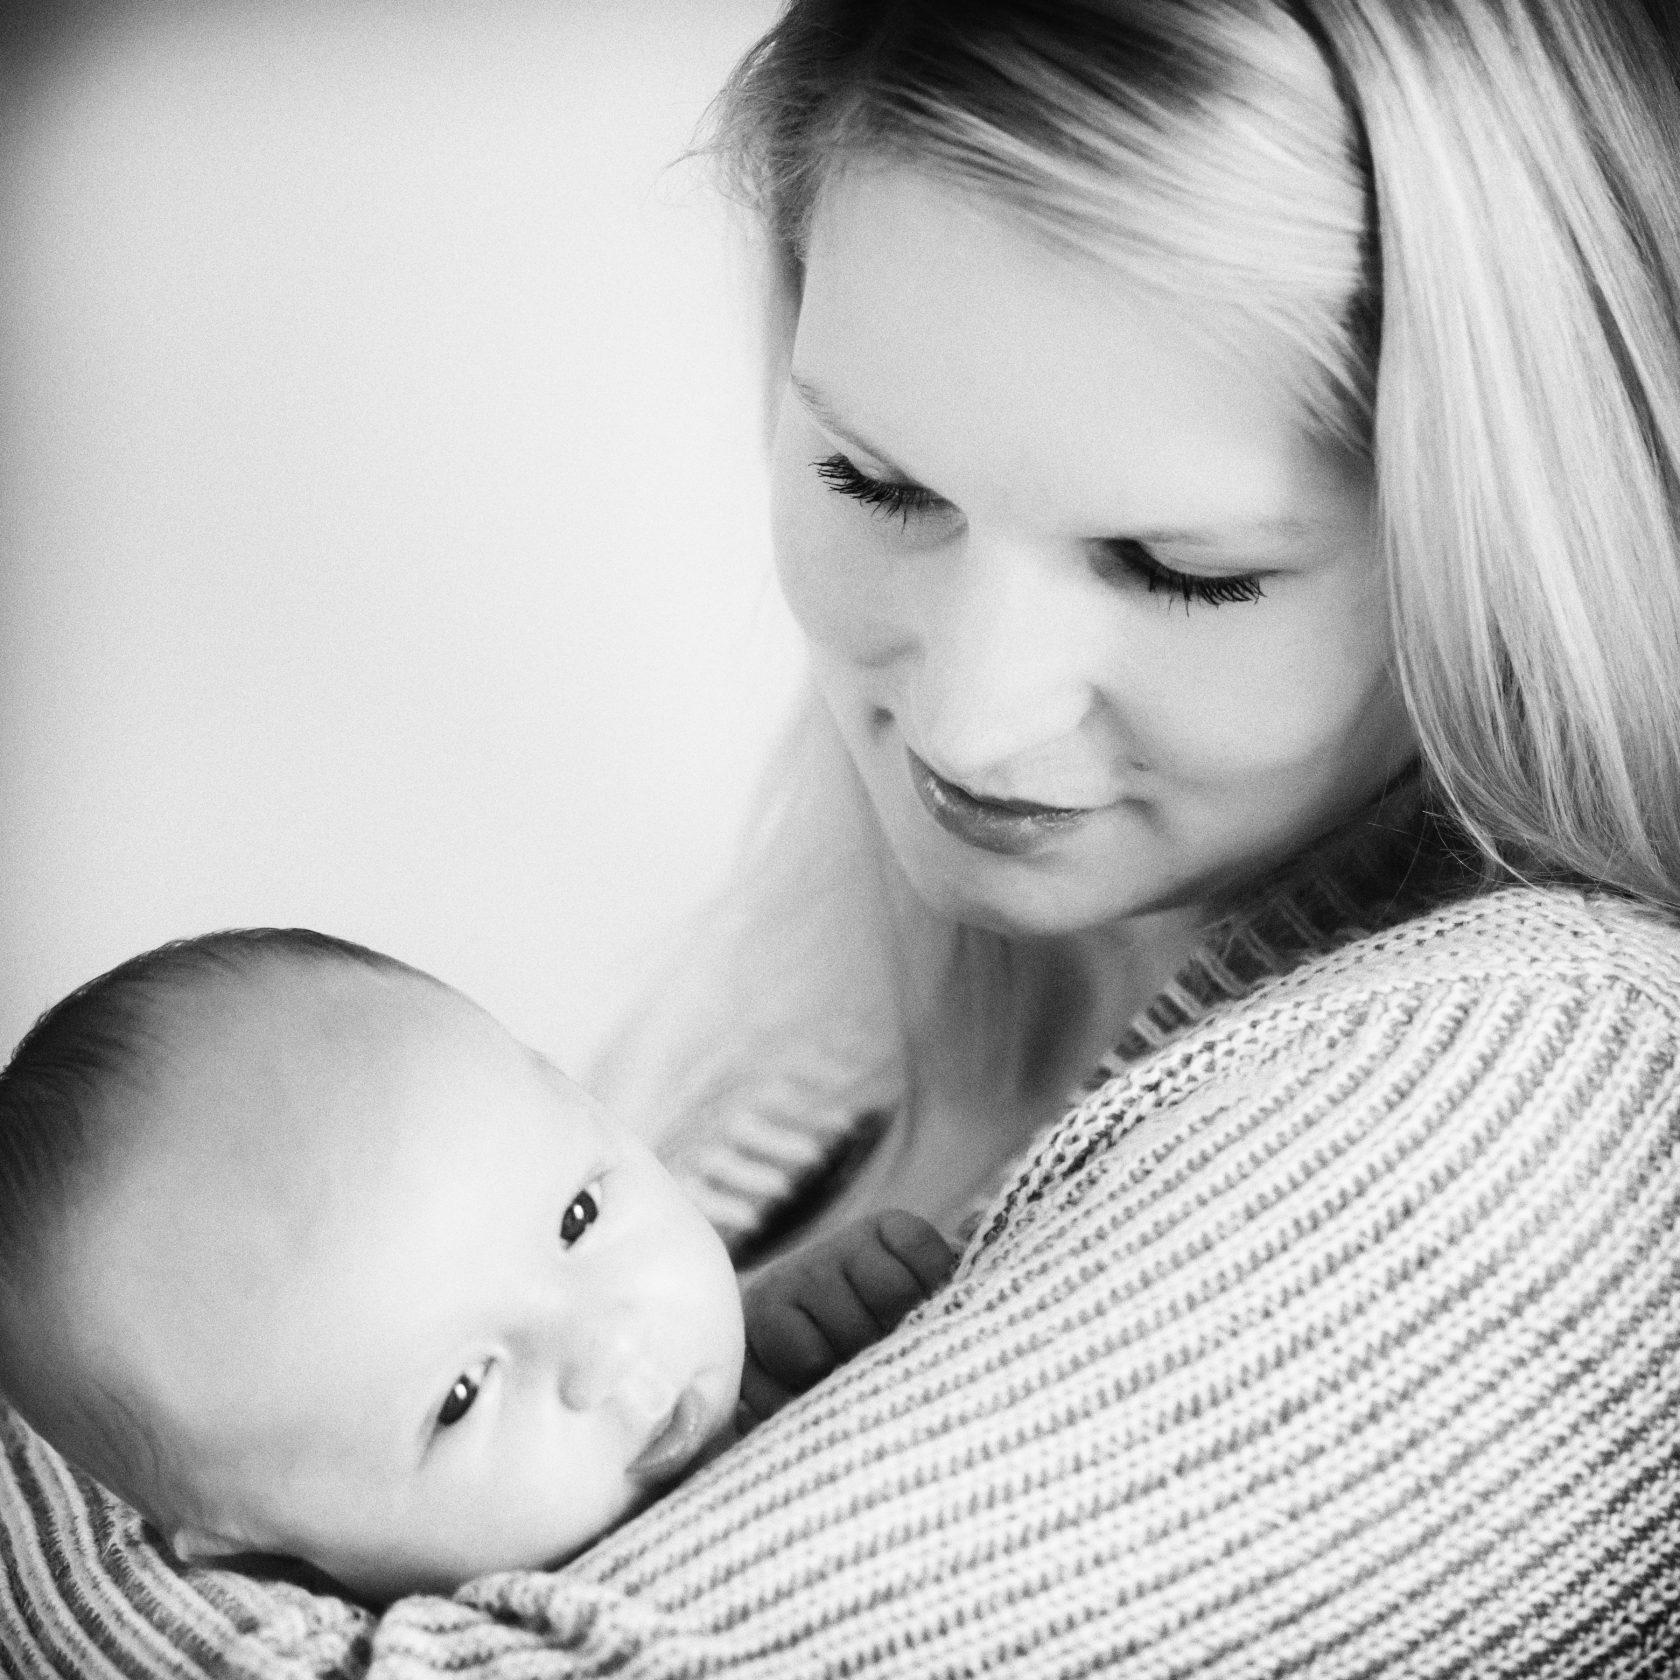 lifstyle-reportage-newborn-portret-newlife-photography-verzinhet-fotografie-MVDK_20141115_0201